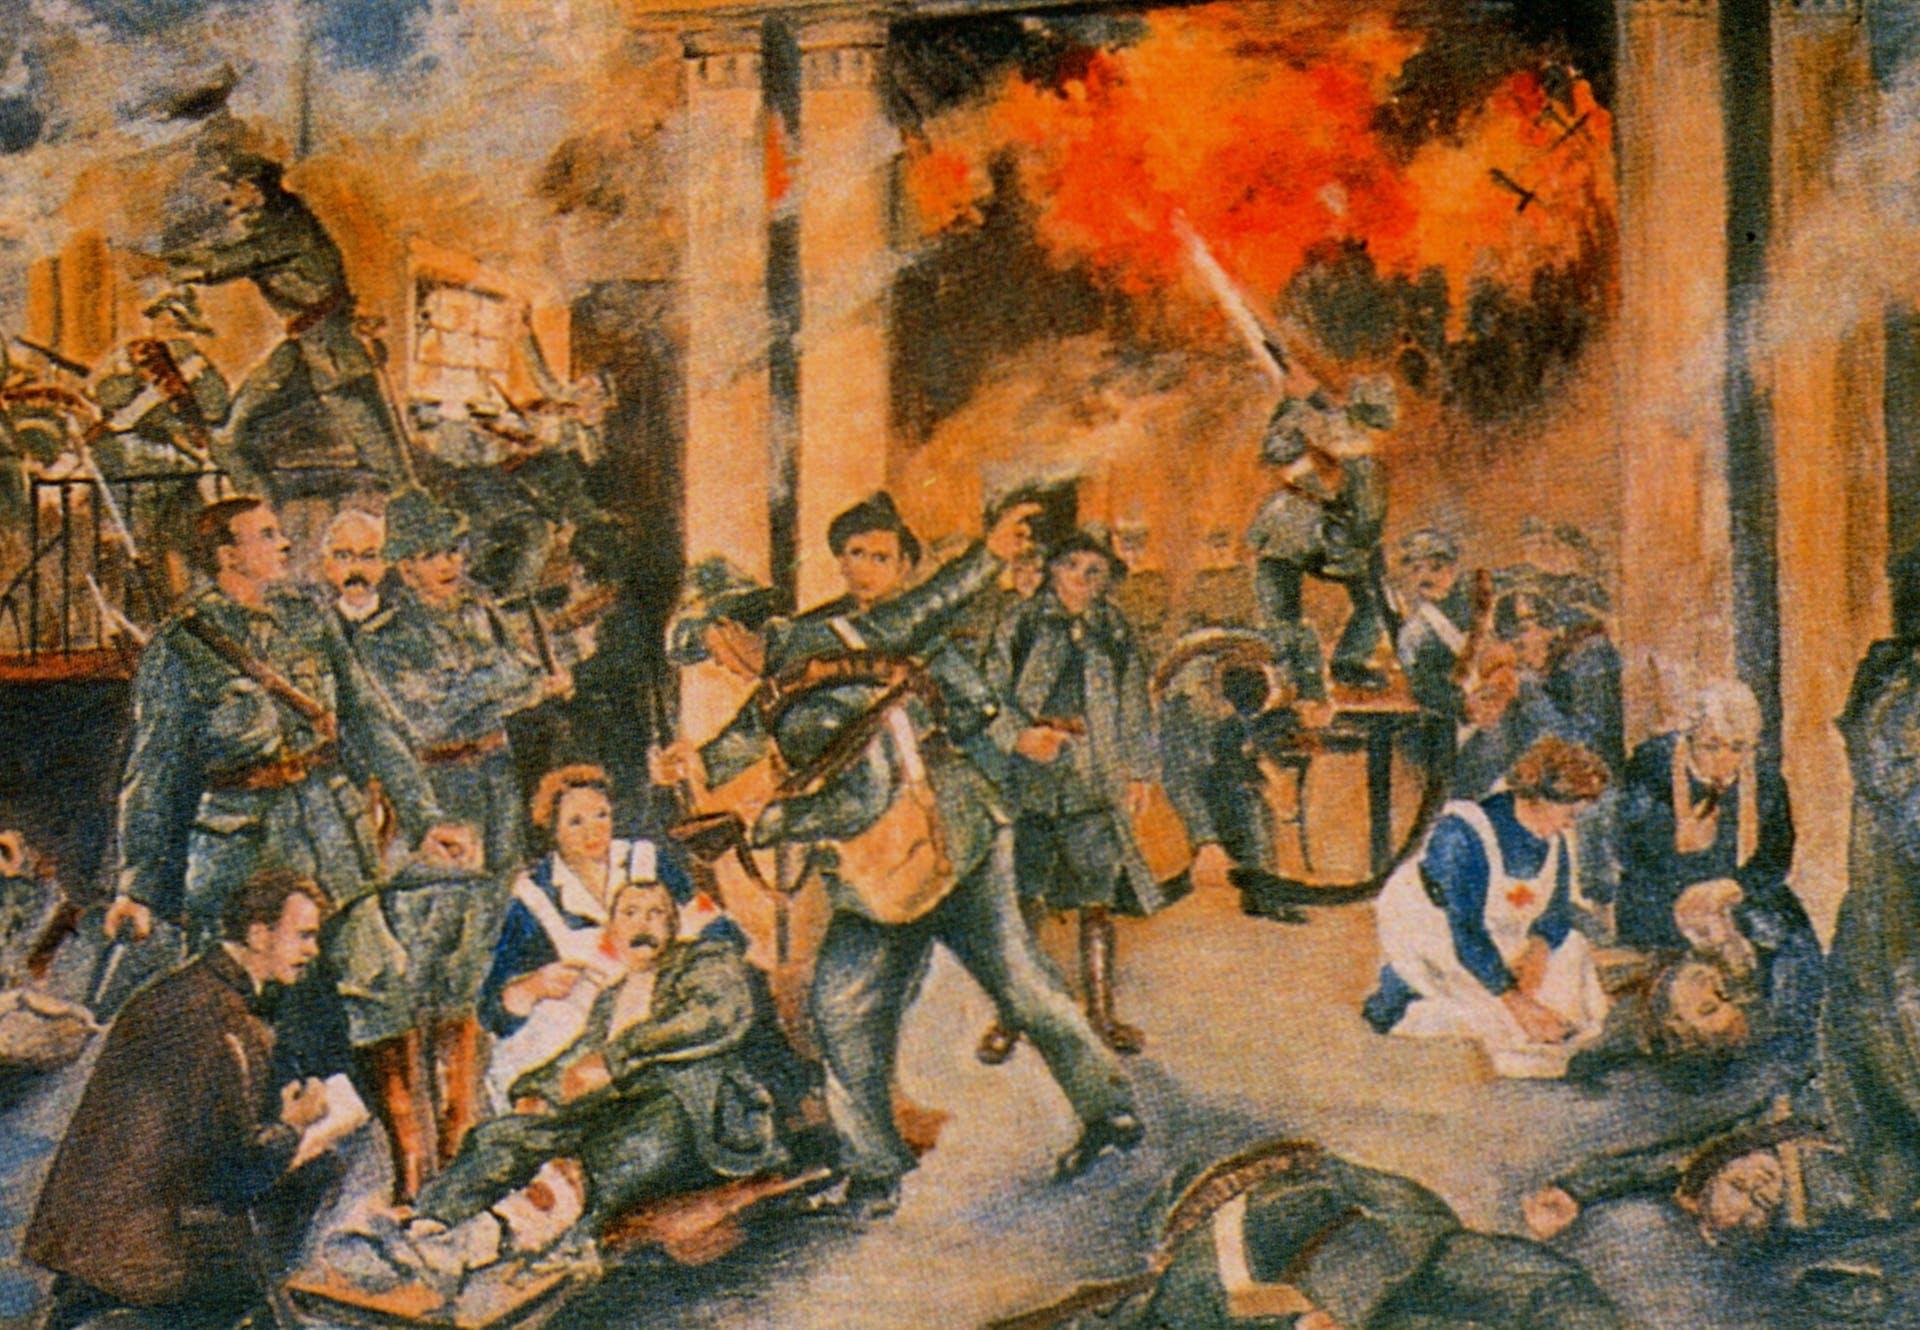 Irland borgerkrig